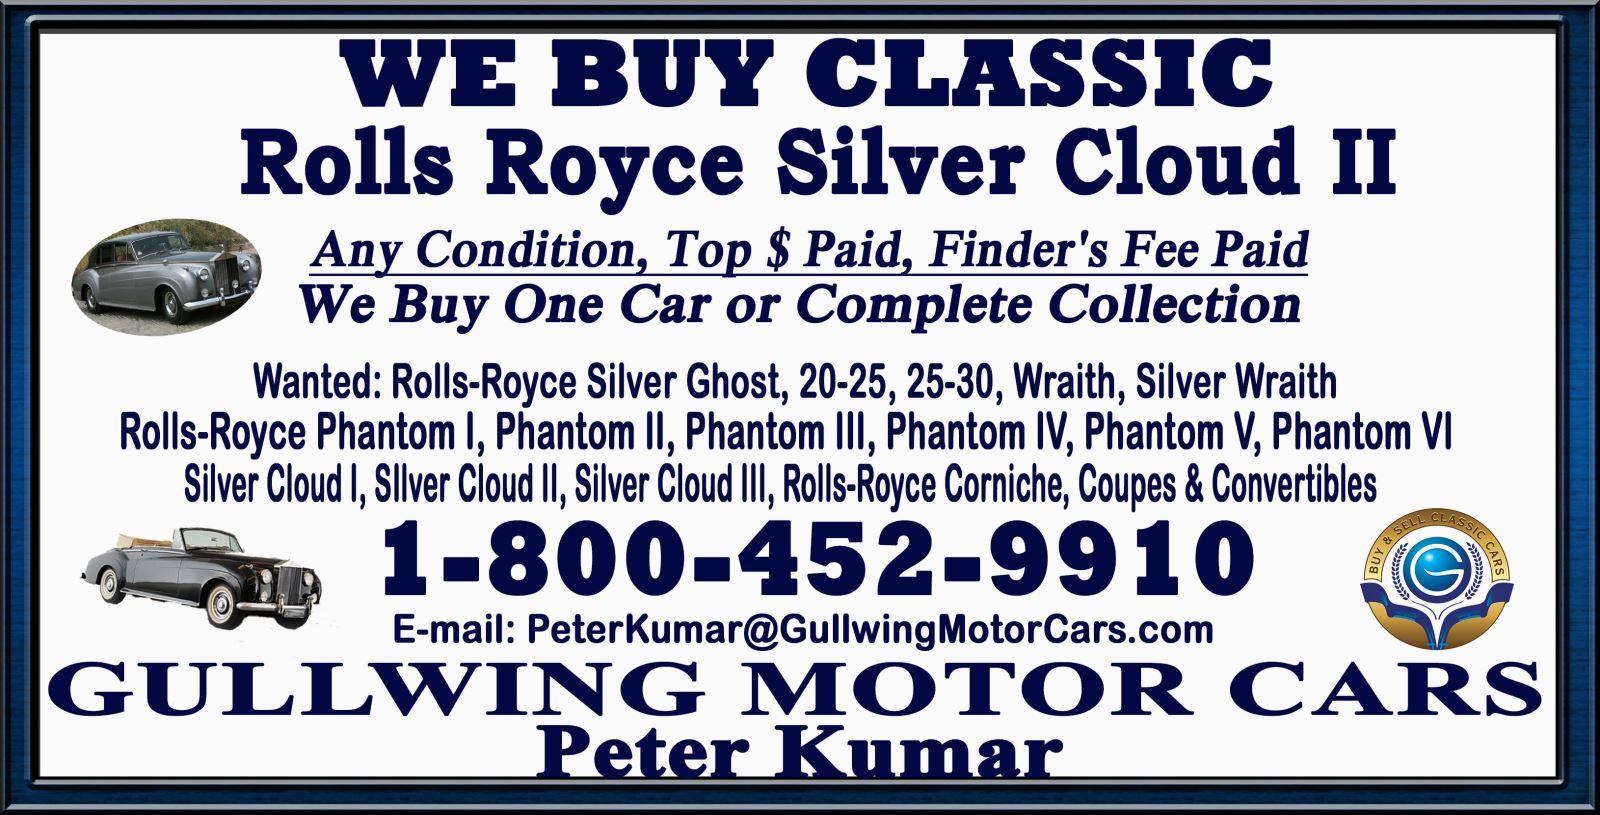 Sell Classic Rolls Royce Silver Cloud II | Call Gullwing Motor if Vintage Rolls Royce Silver Cloud II For Sale